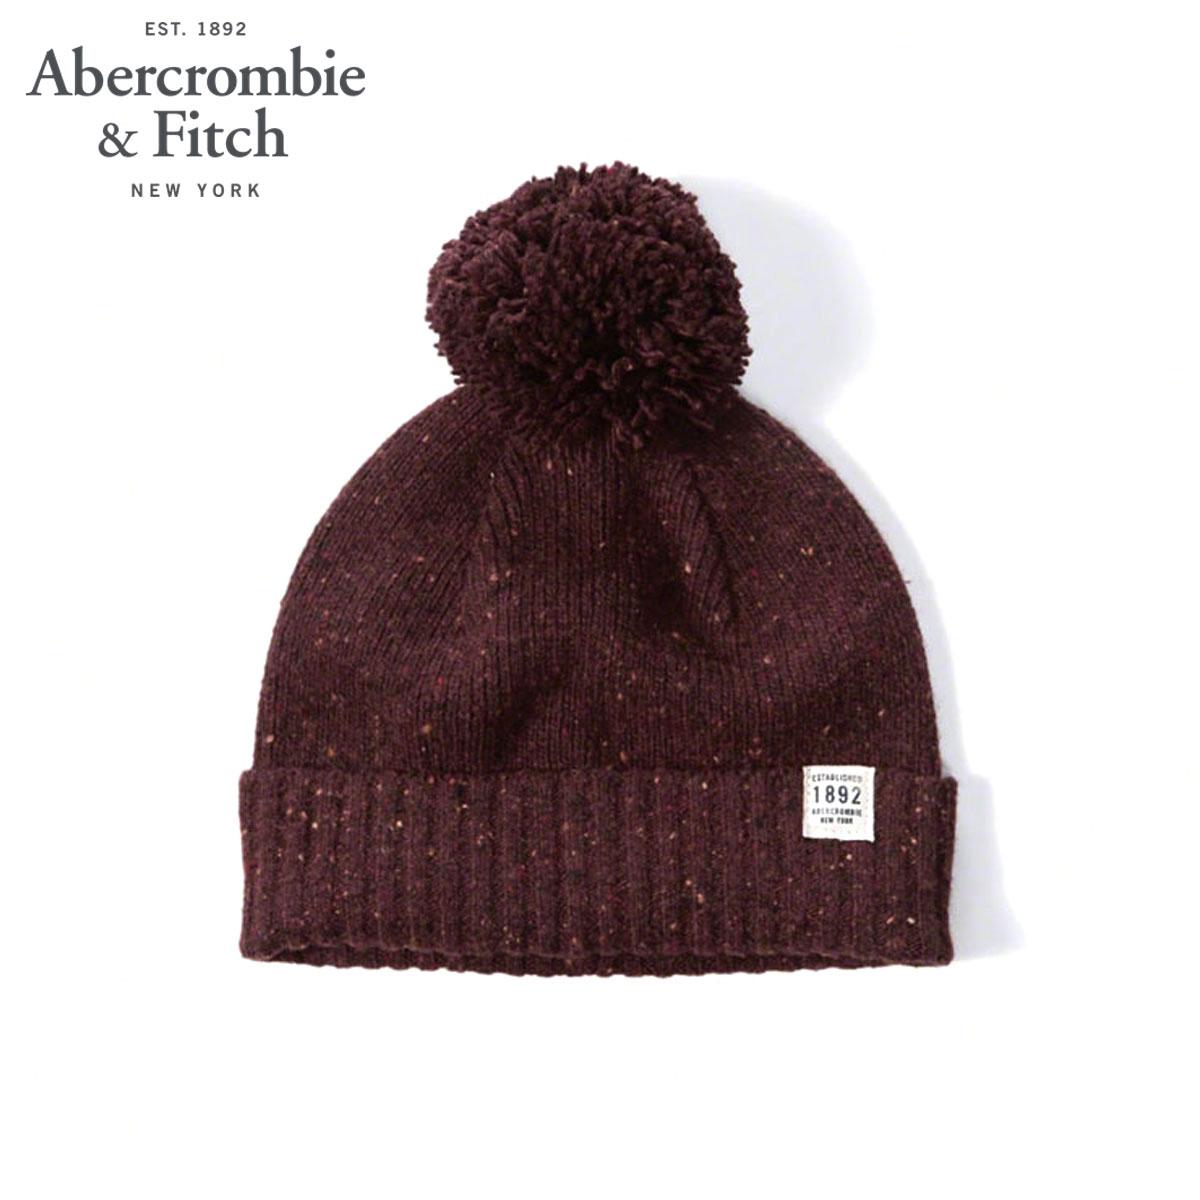 b5187bf0 ABBA black Abercrombie & Fitch regular article men knit cap FOLDOVER  POM BEANIE 116- ...